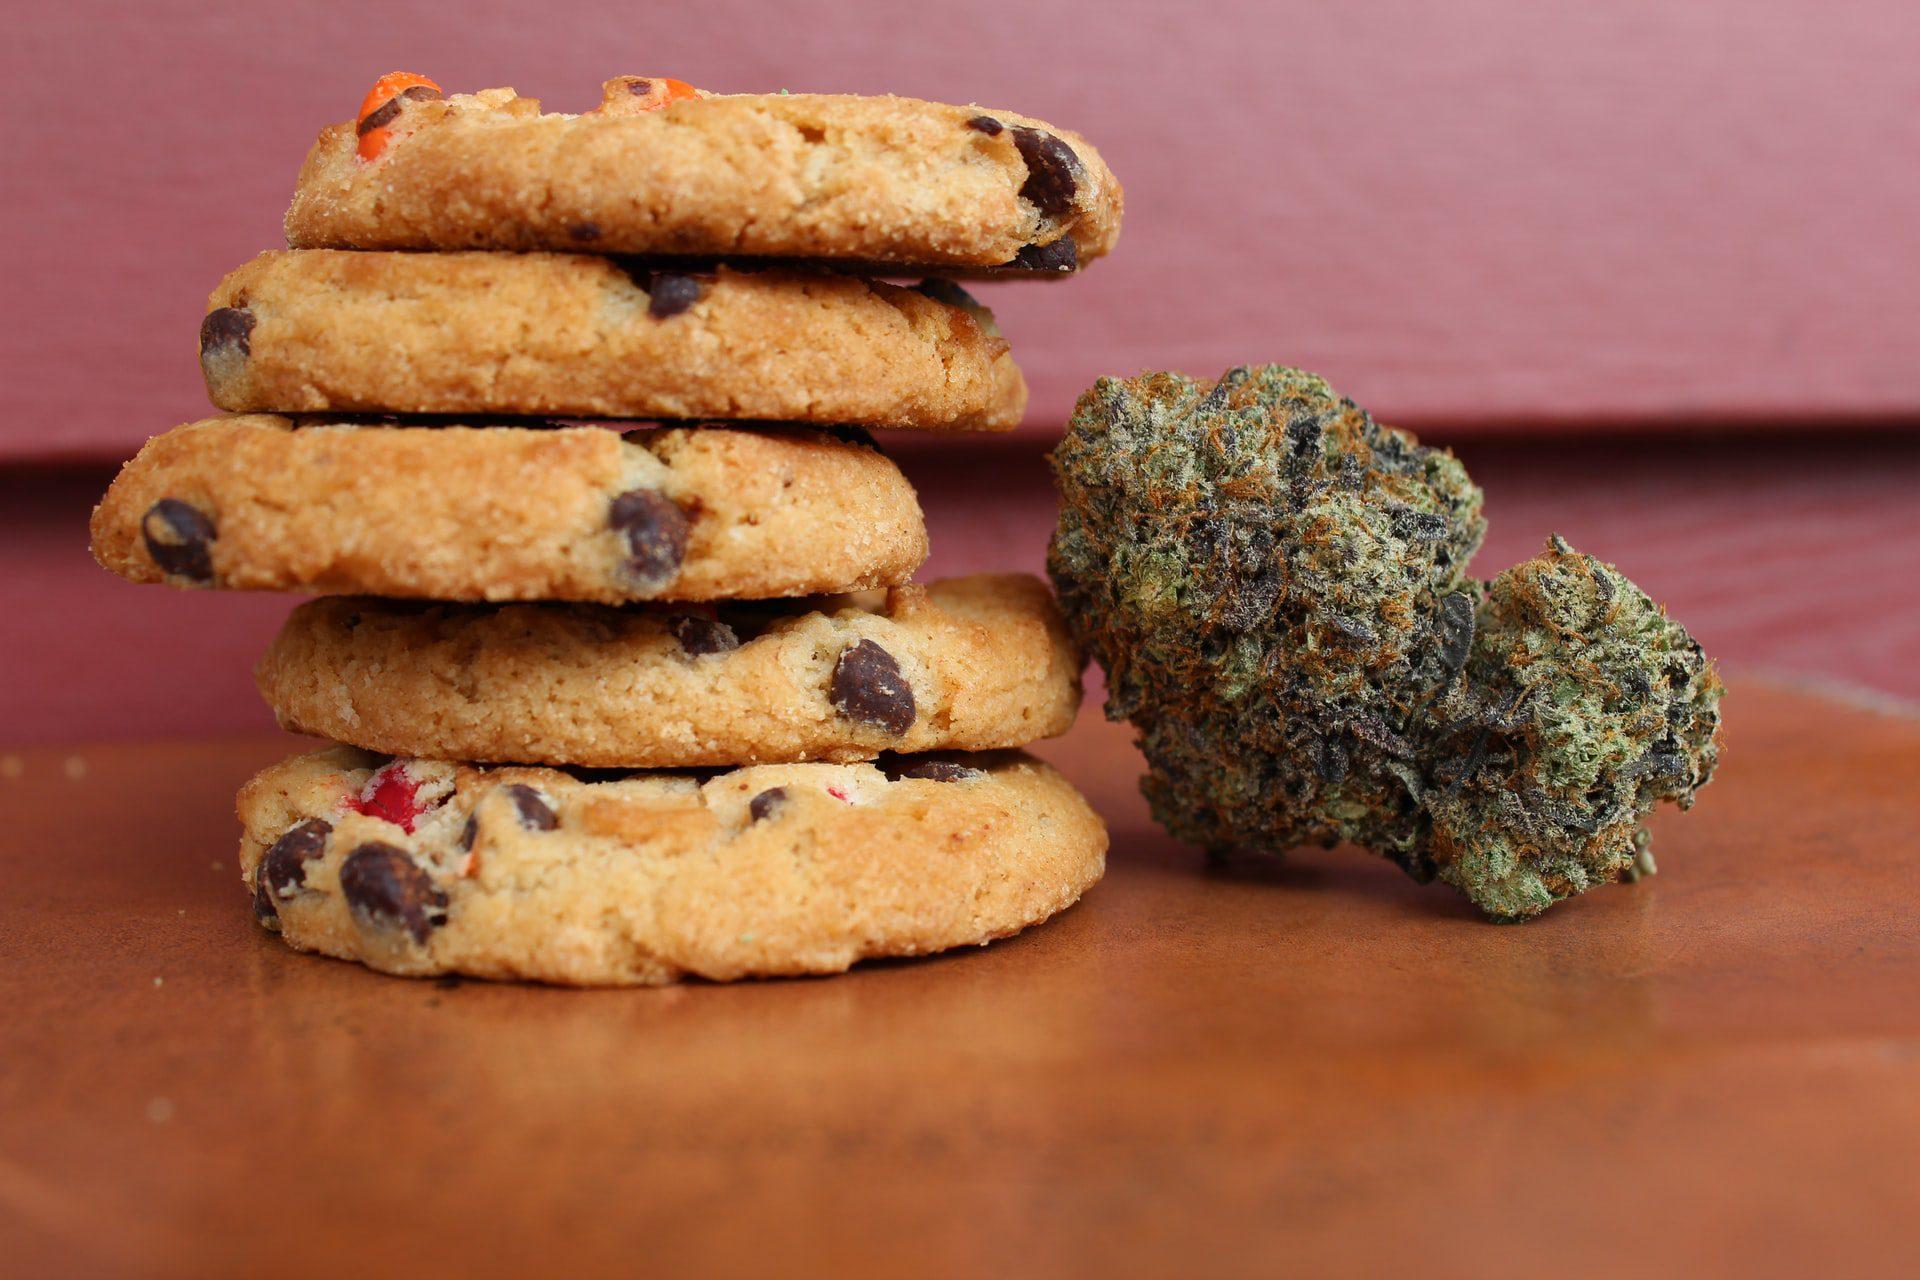 How to Use Marijuana Without Smoking It